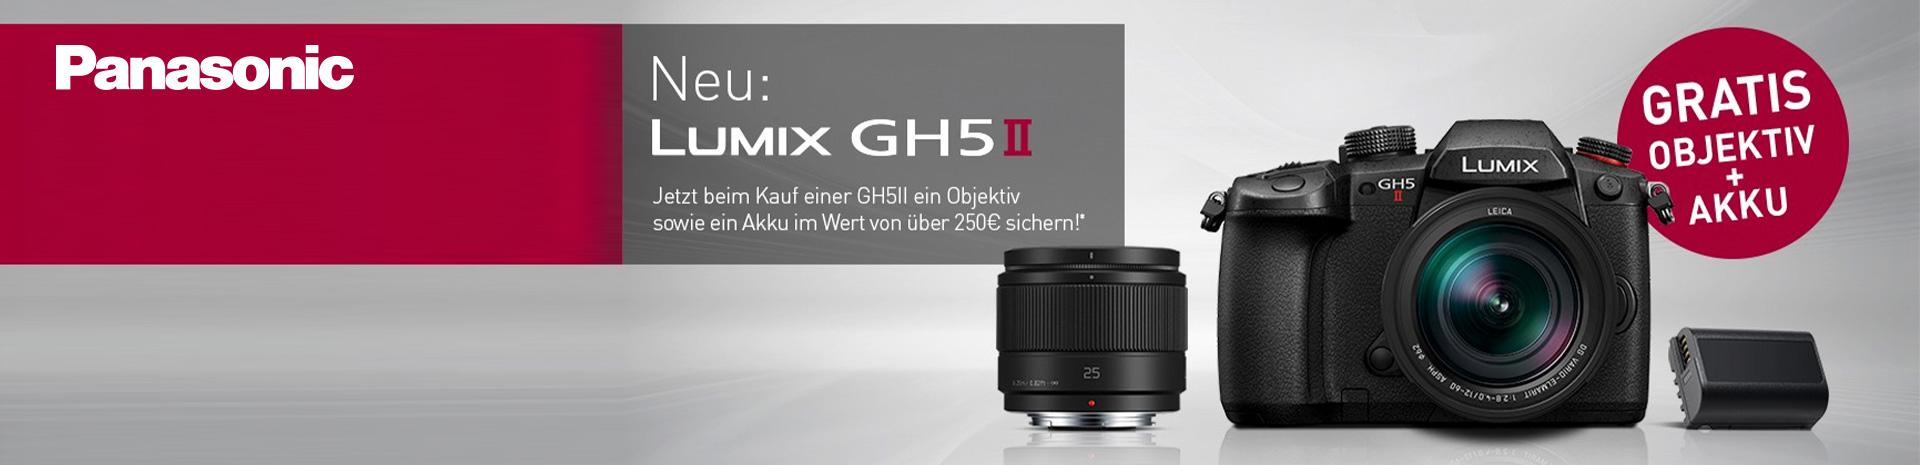 Panasonic Lumix S5 Einführungsaktion